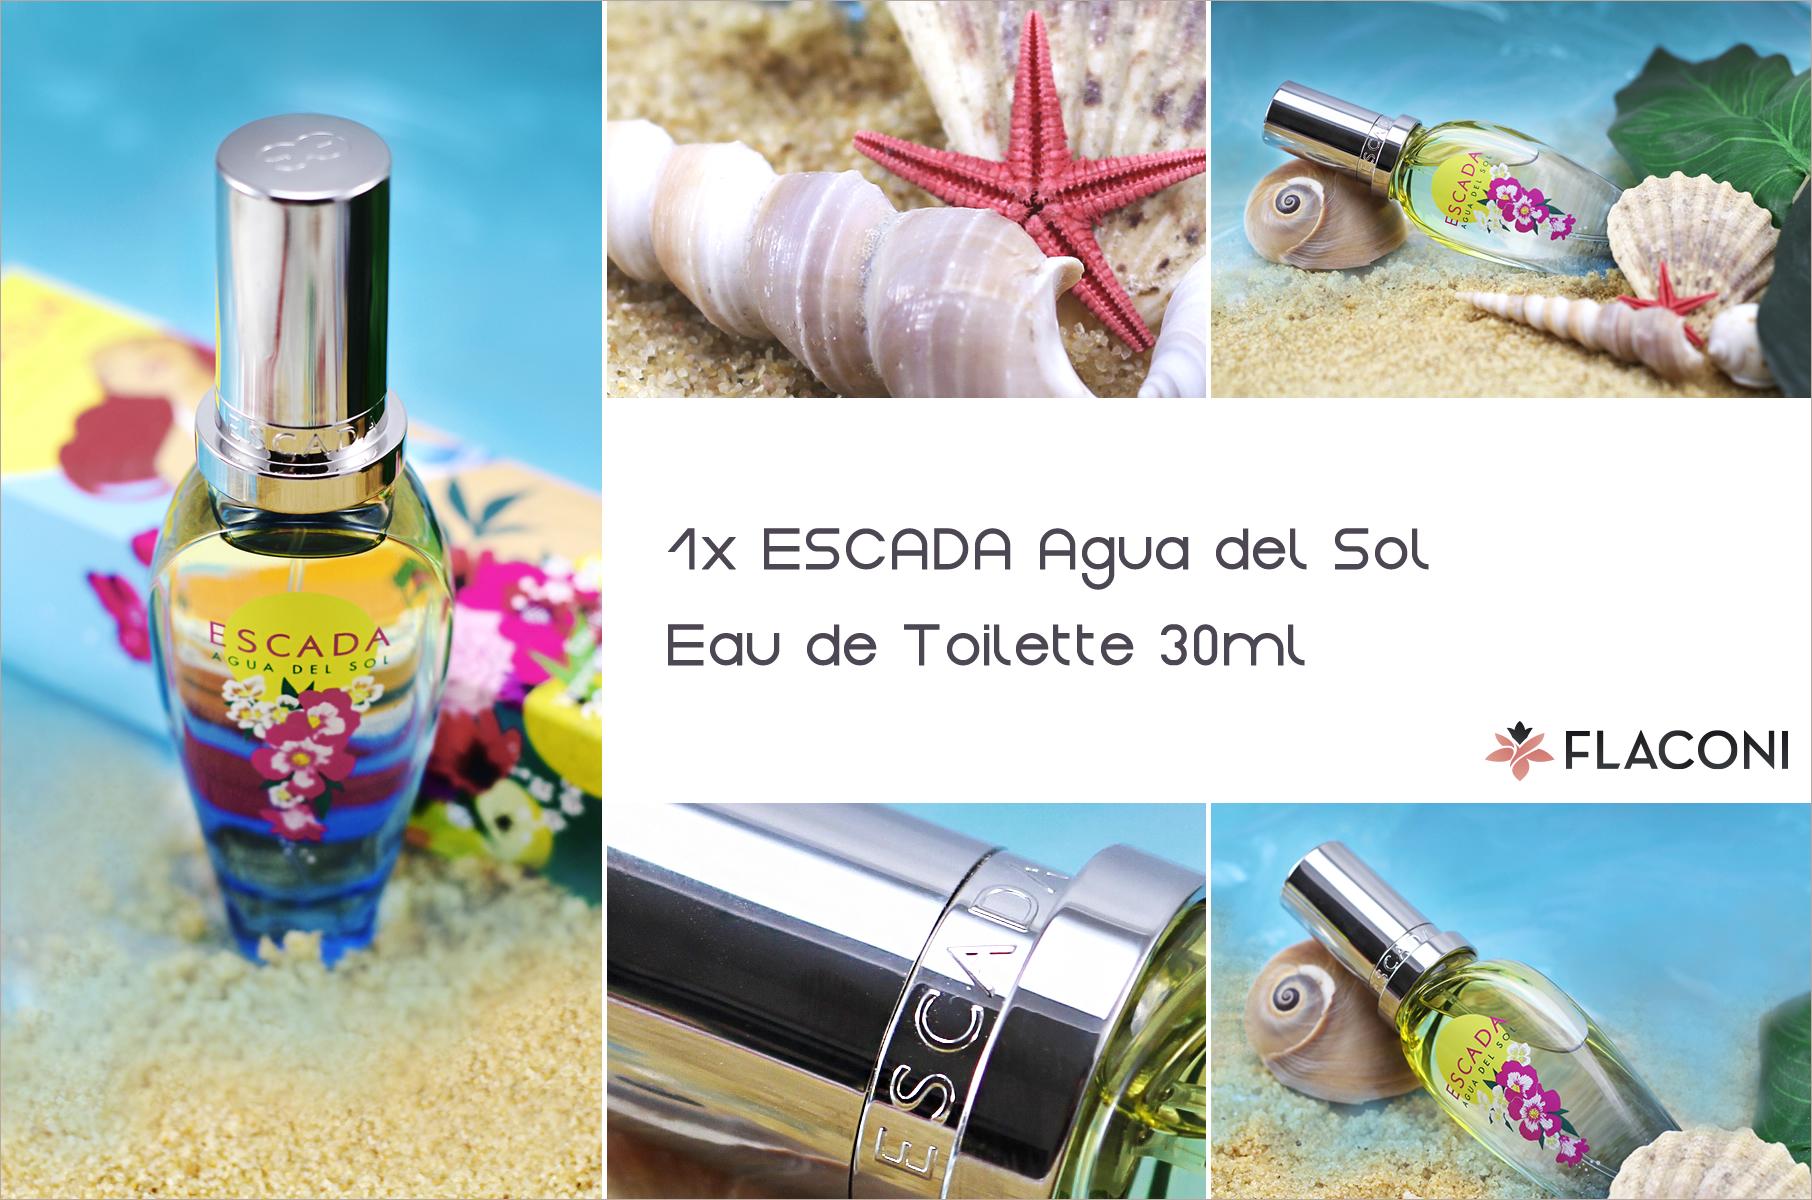 3 Jahre A Little Fashion! Gewinnt ein 30ml Flacon ESCADA Agua del Sol Eu de Toilette | https://www.filizity.com/beauty/alittlefashion-geburtstagssause-giveaway-6